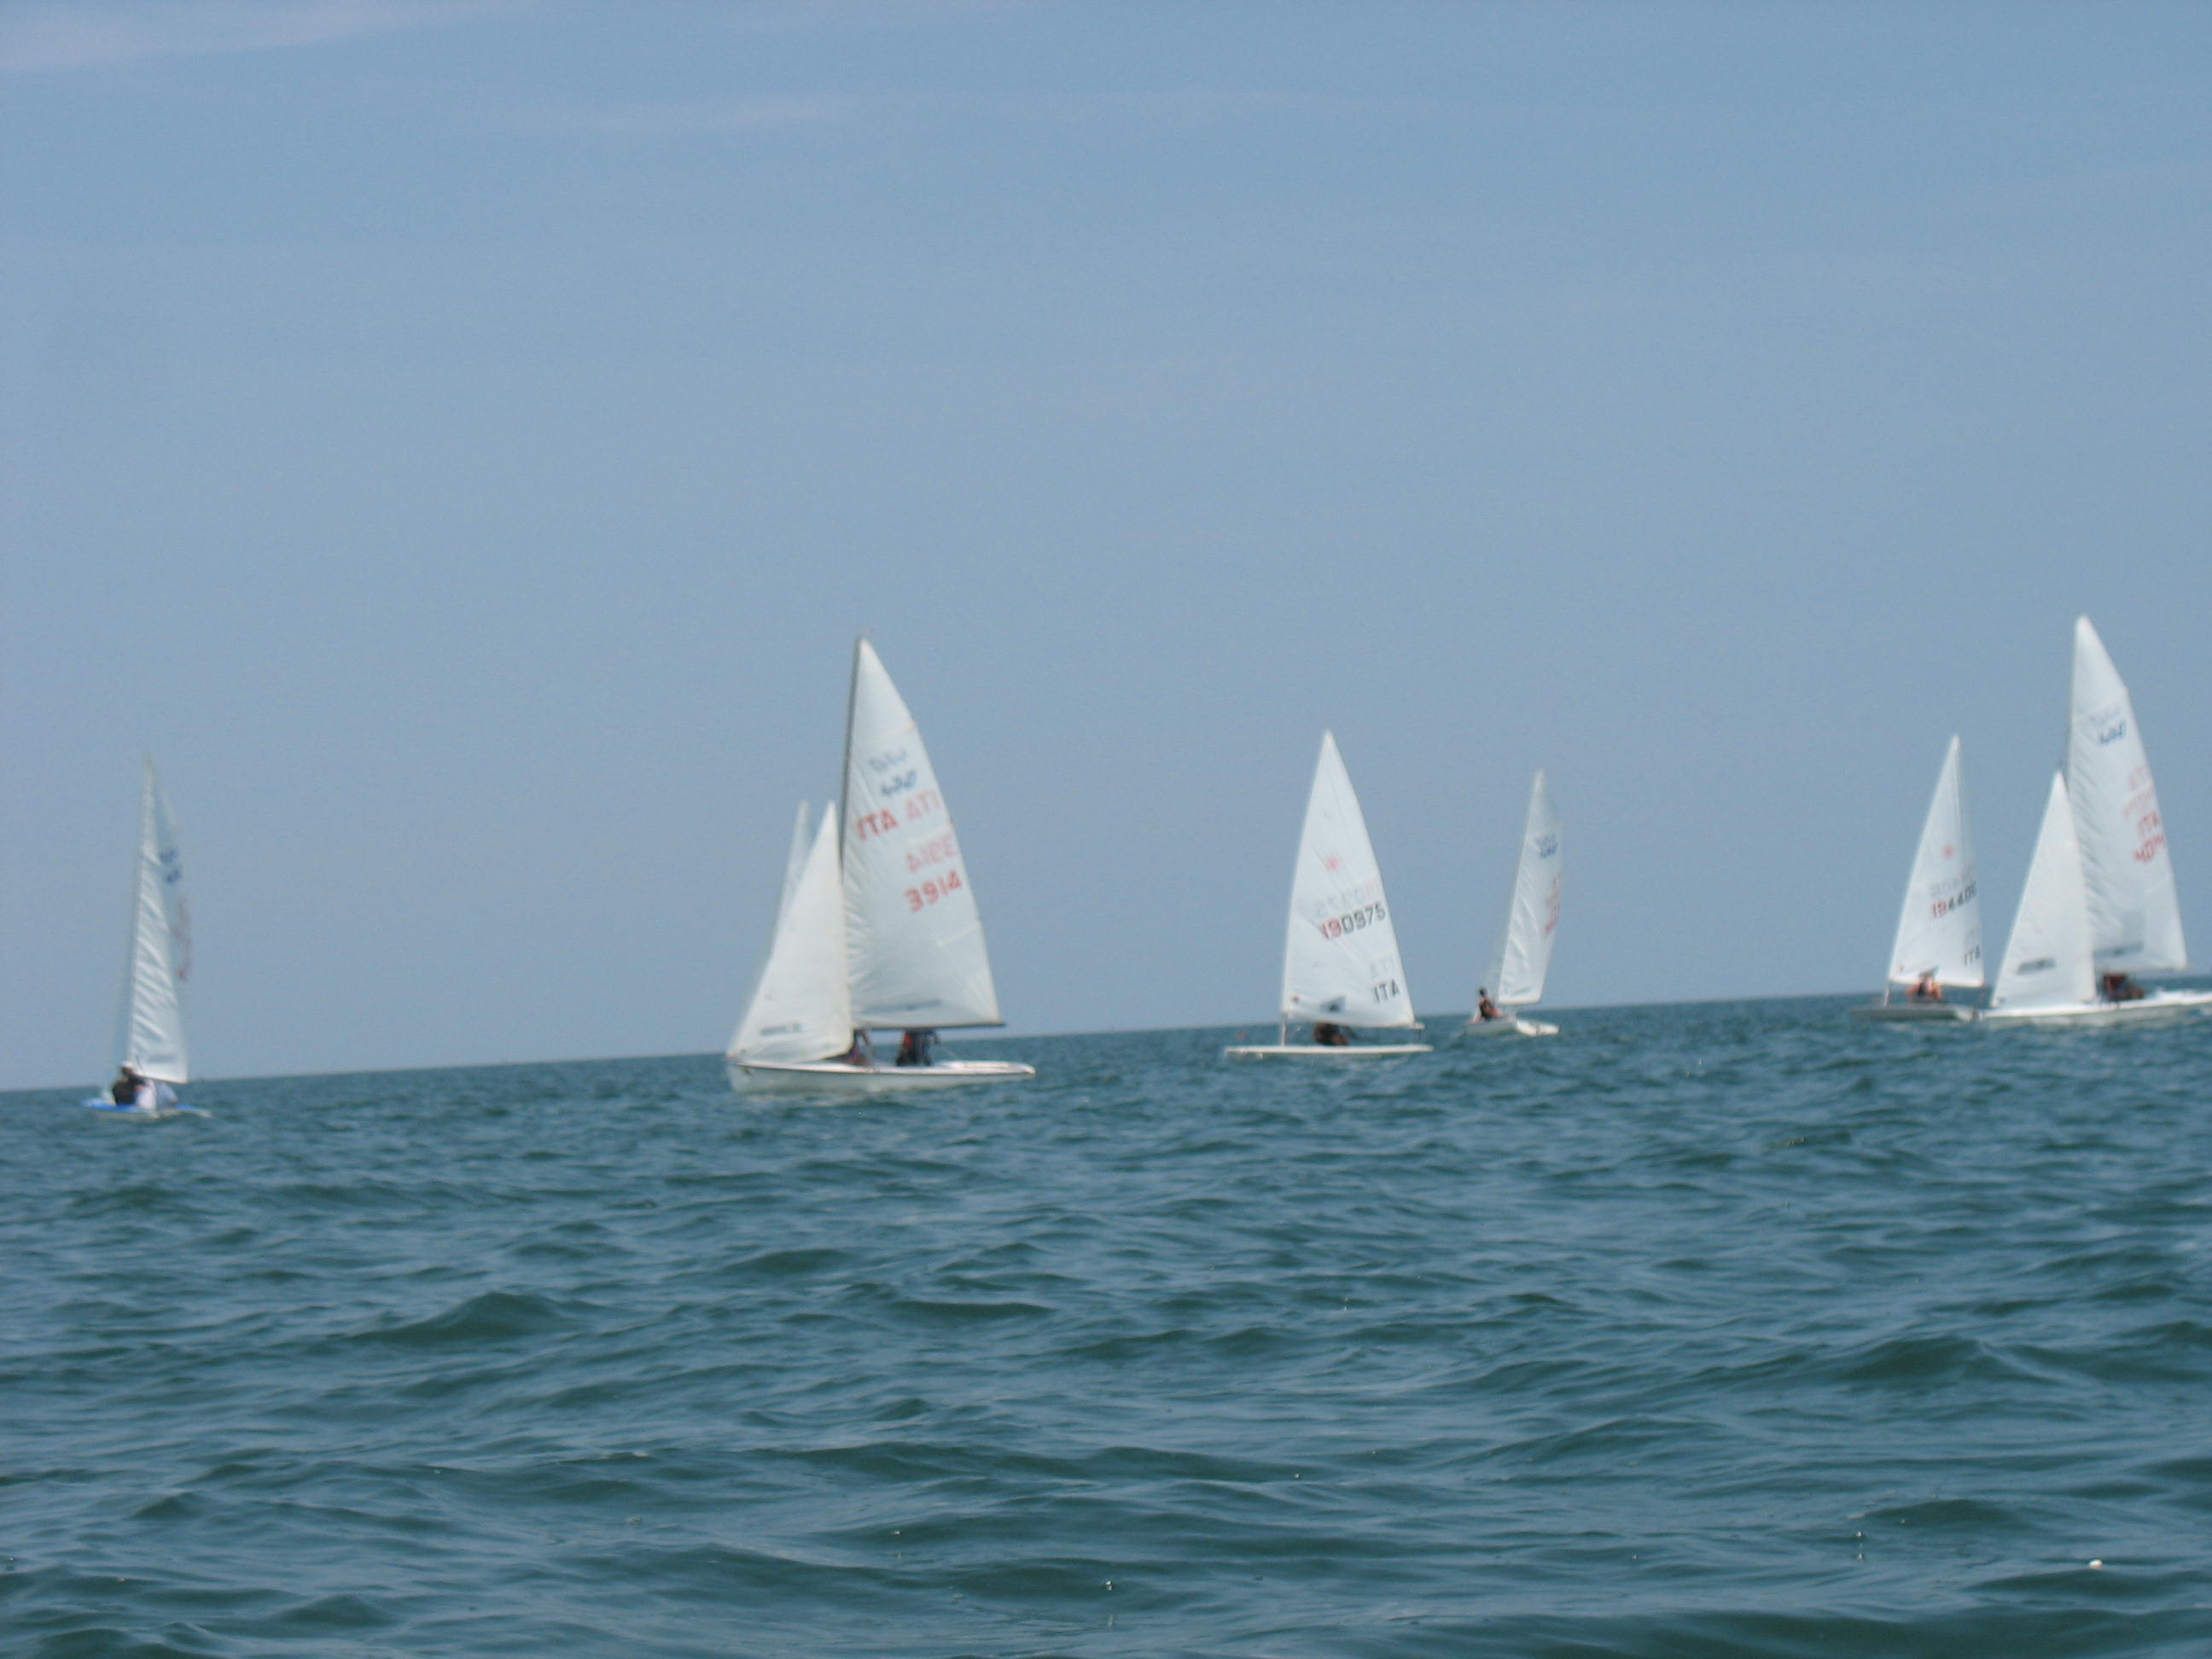 5-torneo-elia-tonelli-27062010-081